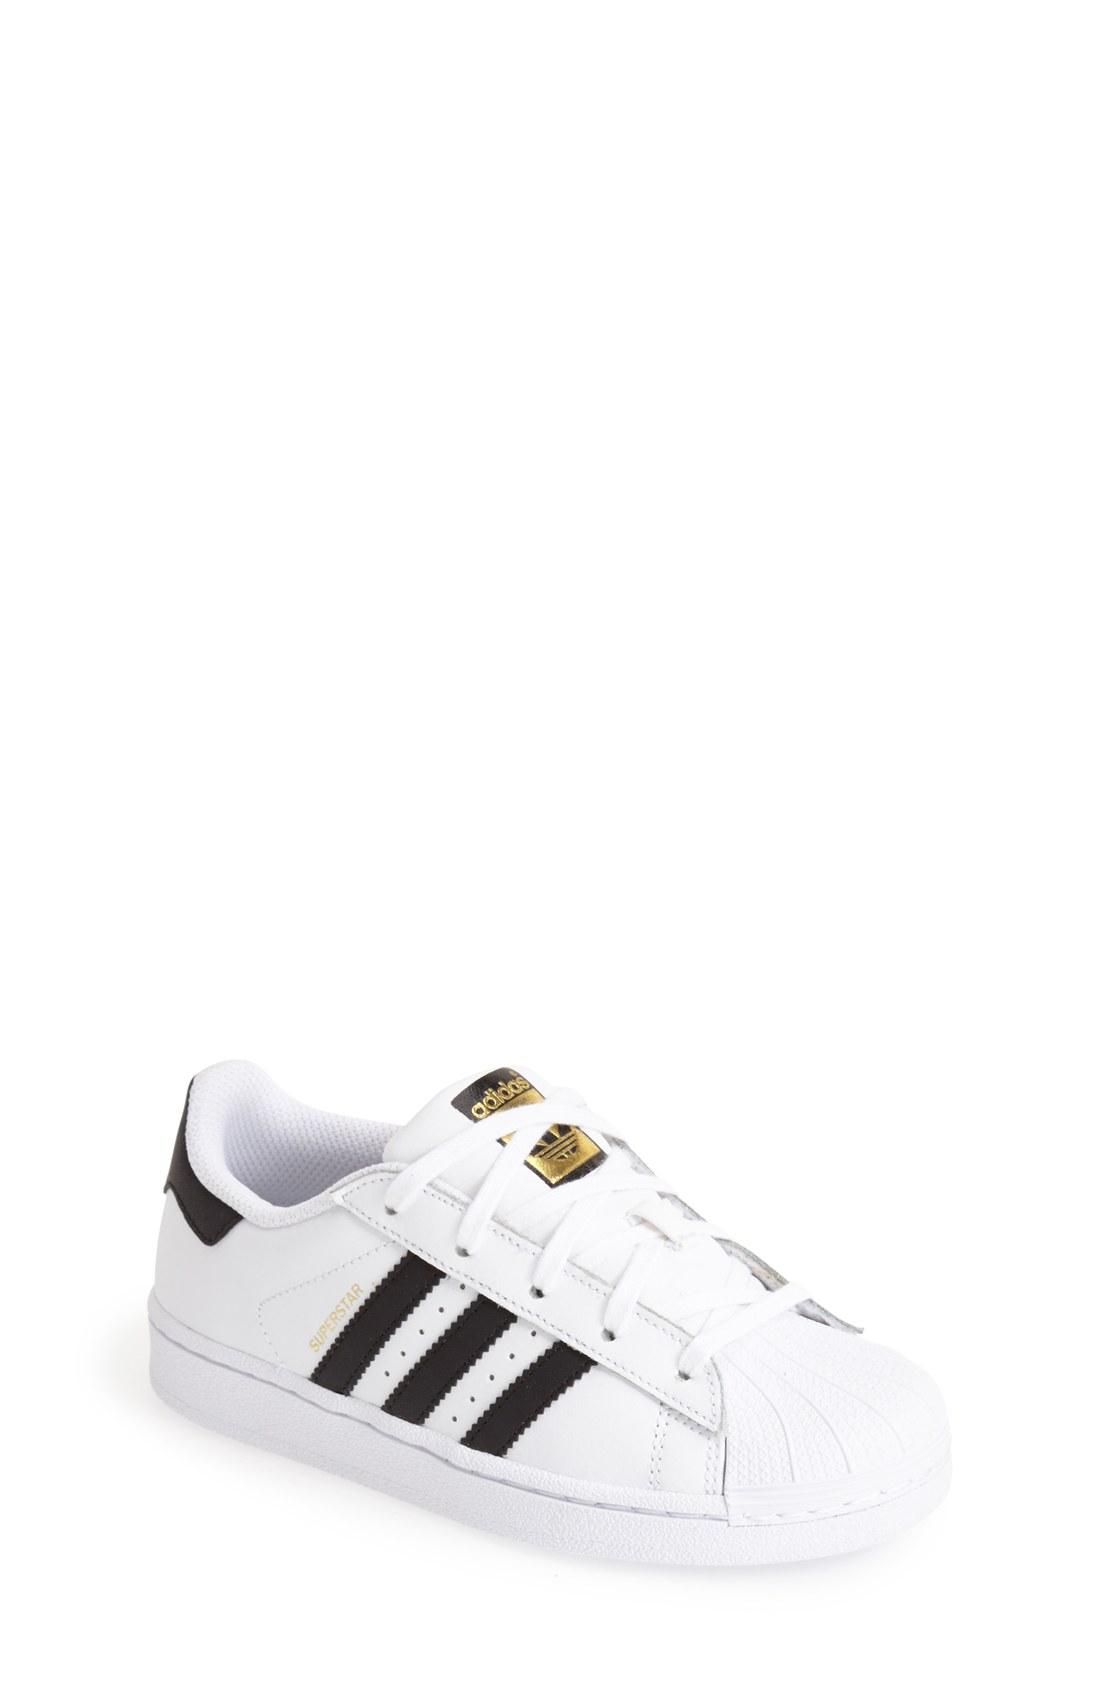 Adidas Superstar Kids adidas u0027superstar cu0027 sneaker (toddler u0026 little kid) | nordstrom YFURDCA